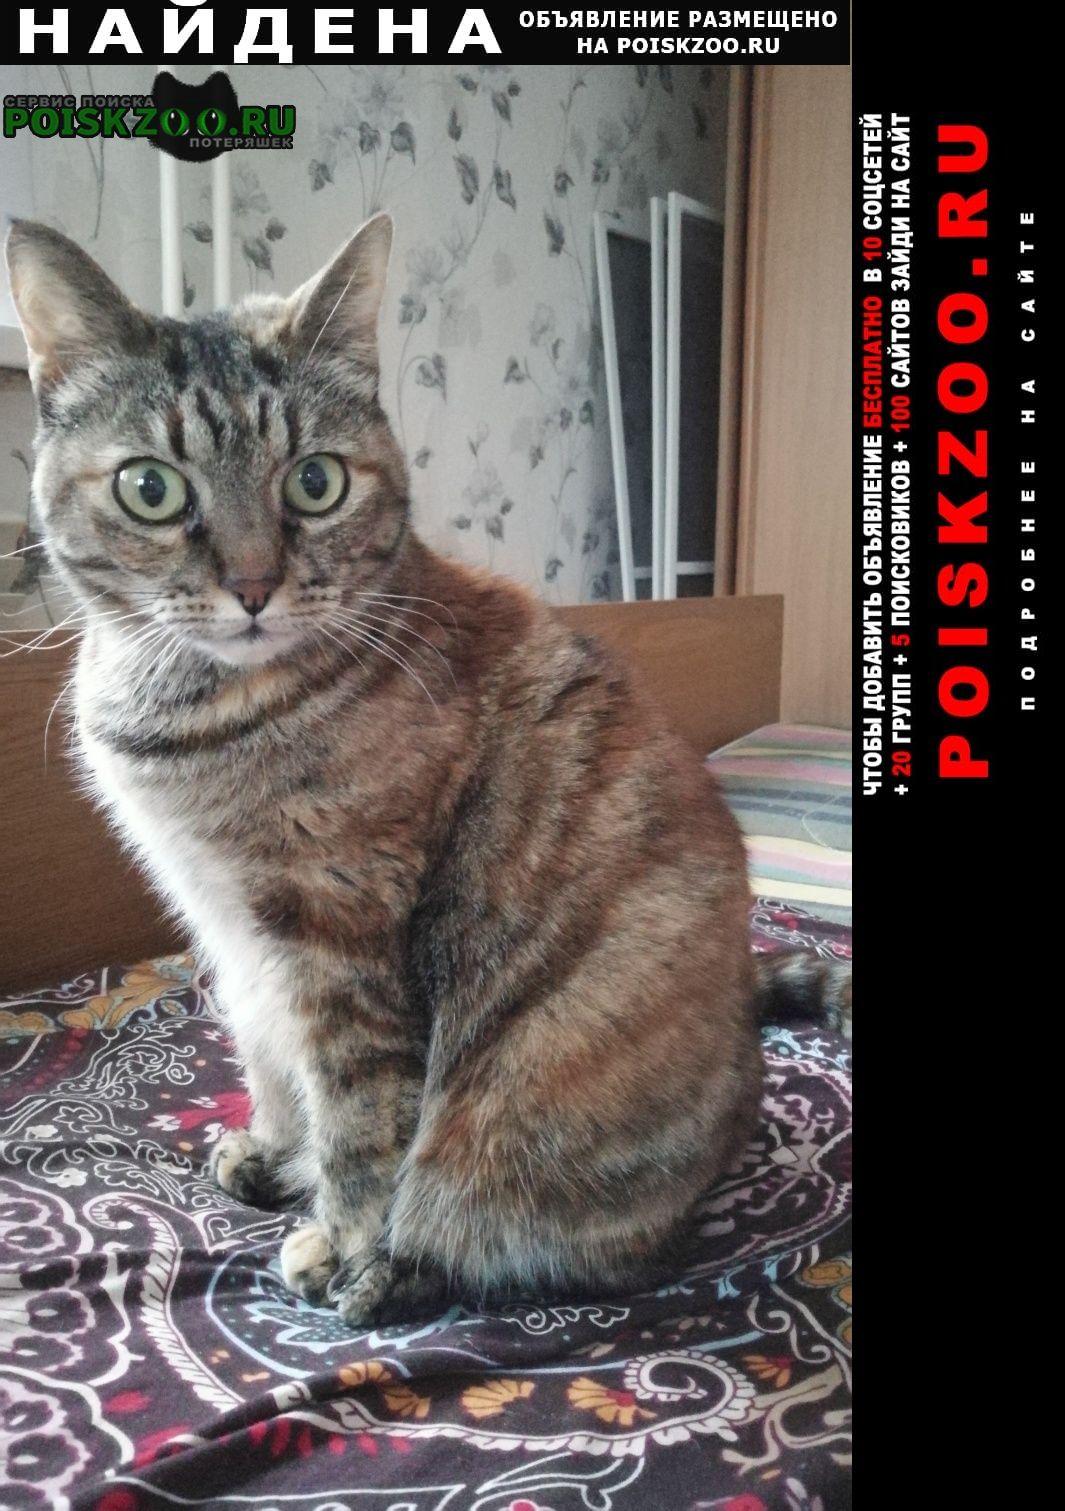 Найдена кошка Ярославль